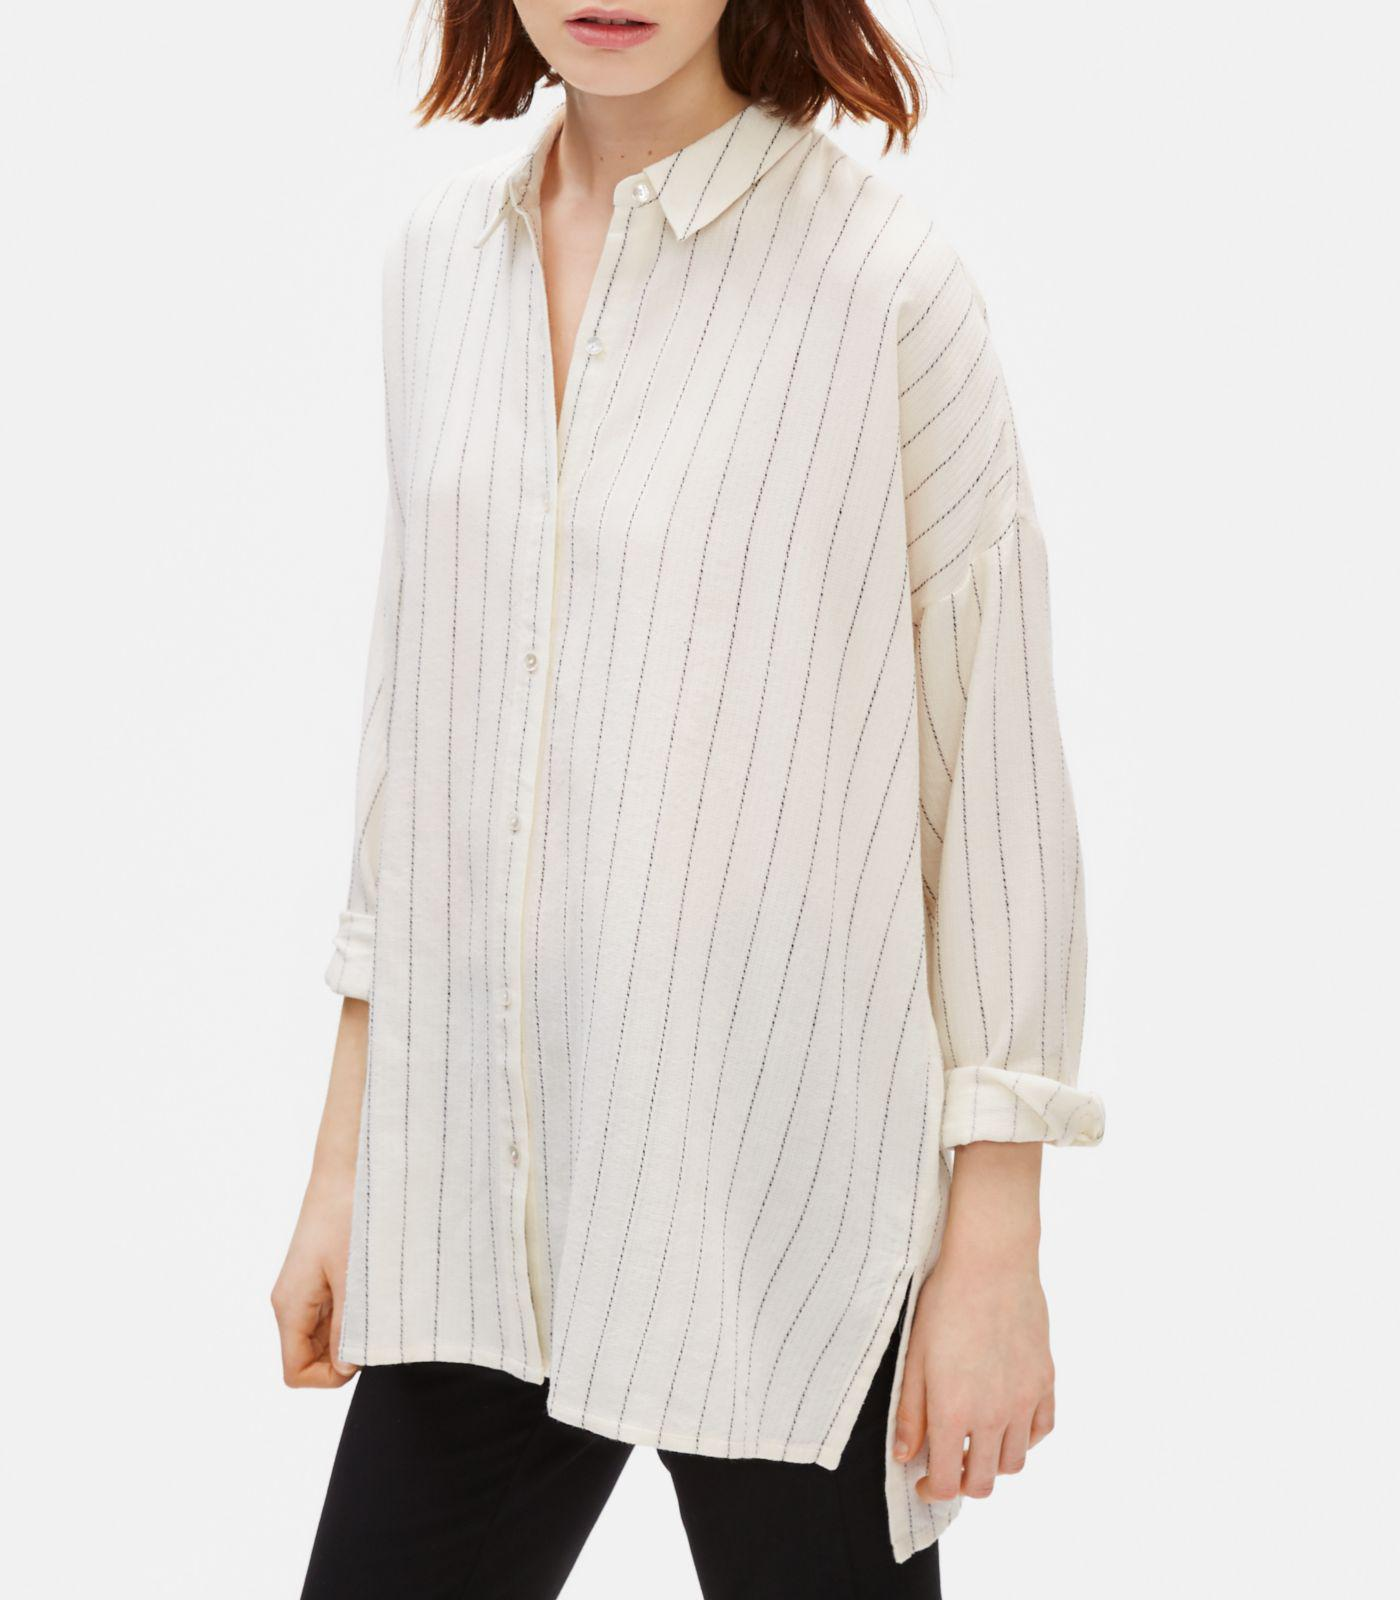 eefaef5c20717c ... White Gauzy Organic Cotton Shirt - Lyst. View fullscreen